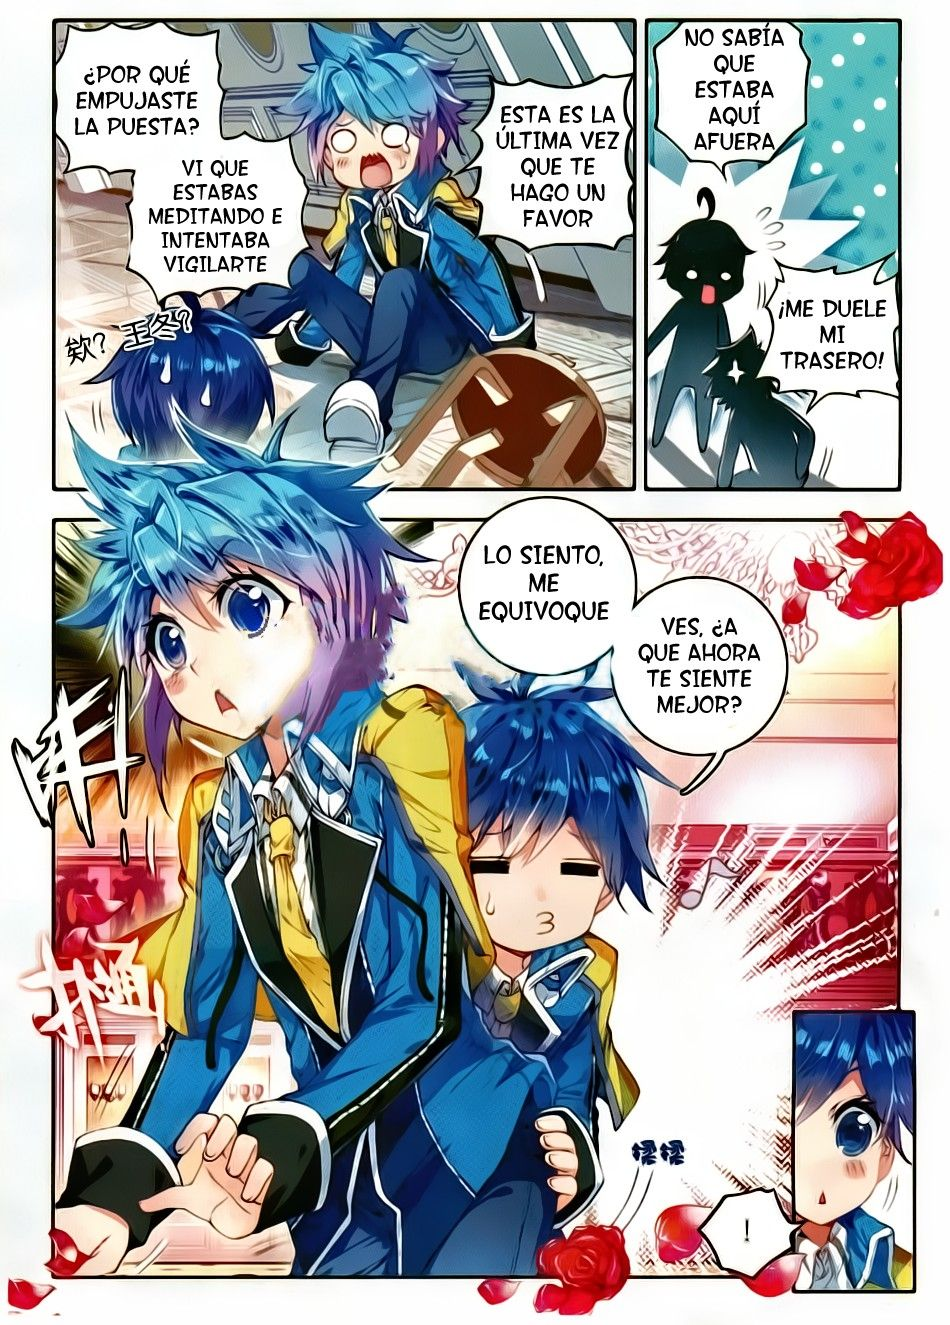 http://c5.ninemanga.com/es_manga/pic2/33/16417/511292/a9203c64df5966e80d44e00dadc195bd.jpg Page 6